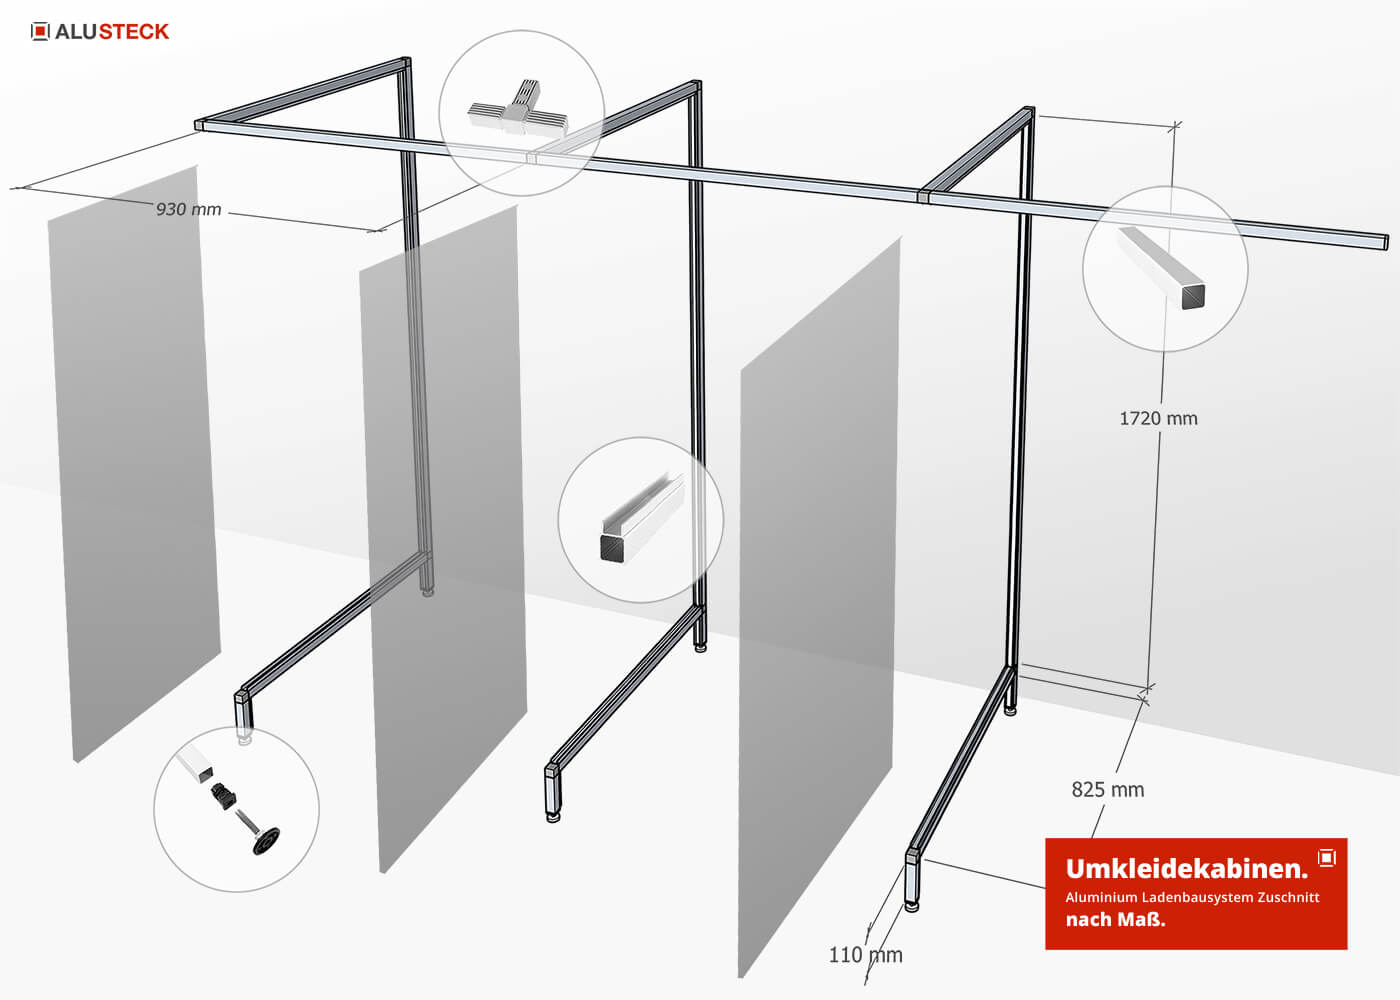 Wandsystem Umkleidekabinen Ladenbausystem